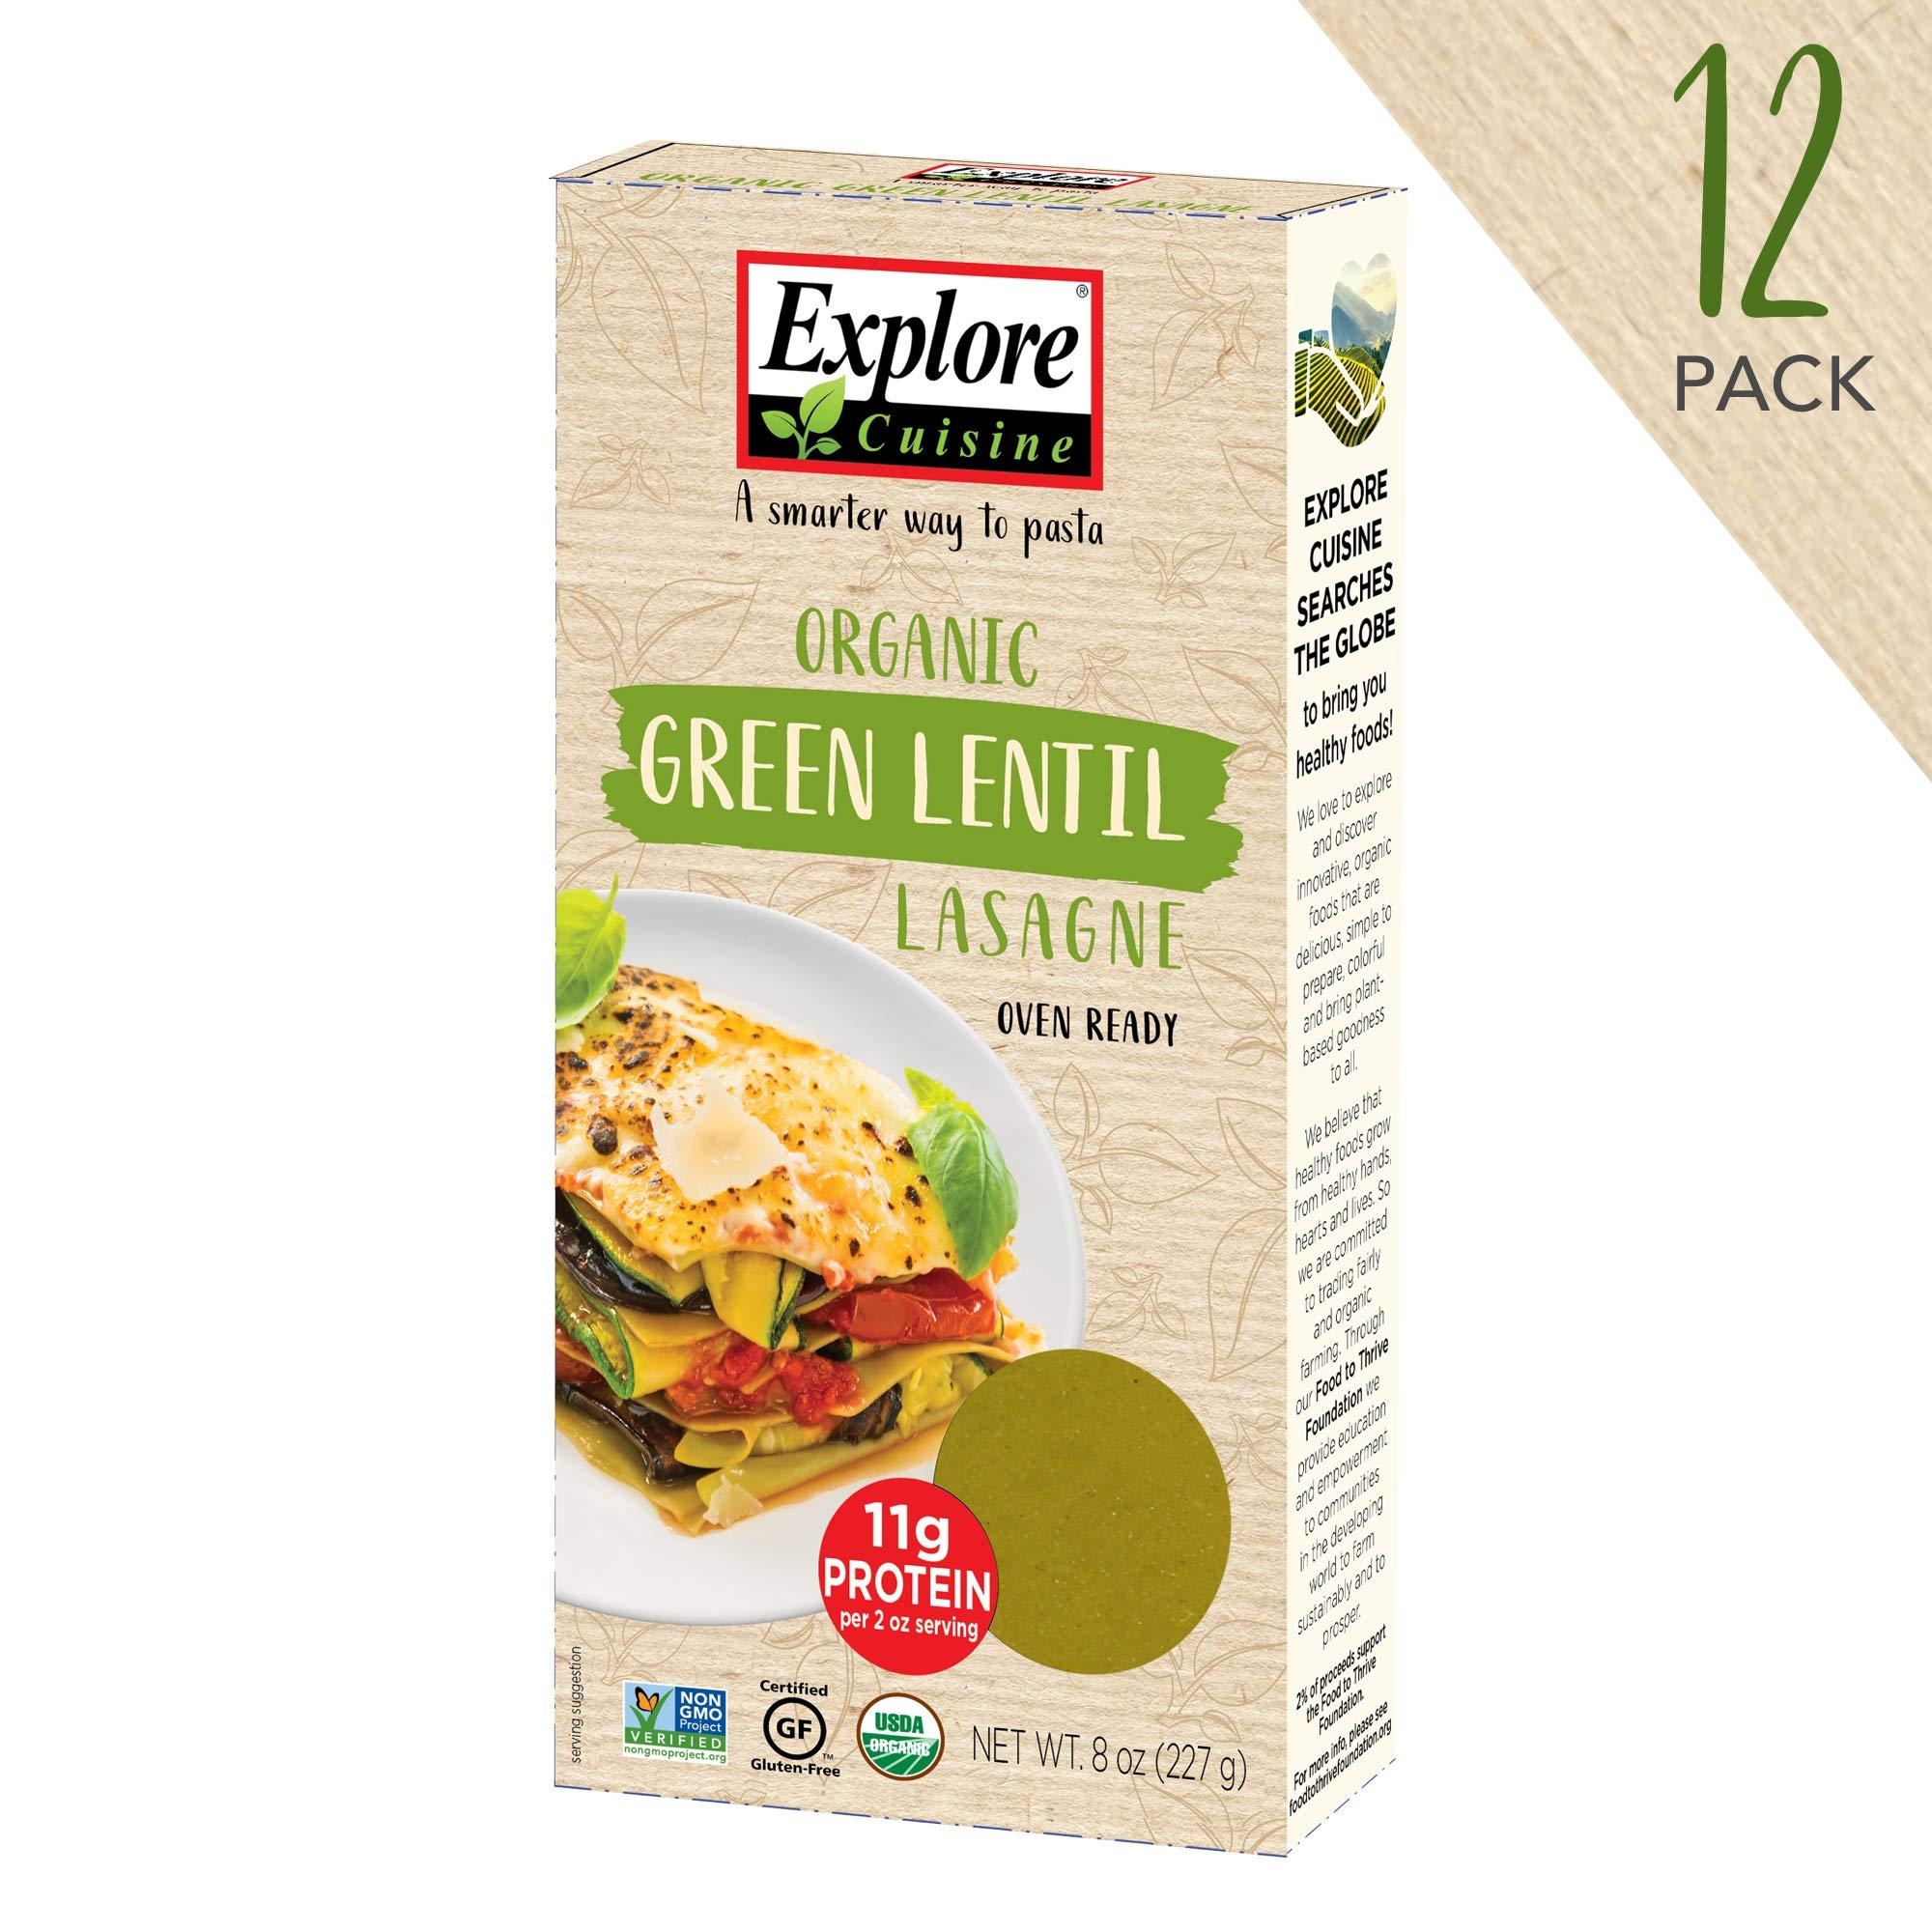 Explore Cuisine Organic Green Lentil Lasagne (12 Pack) - 8 oz - High Protein, Gluten Free Pasta, Easy to Make - USDA Certified Organic, Vegan, Kosher, Non GMO - 48 Total Servings by EXPLORE CUISINE